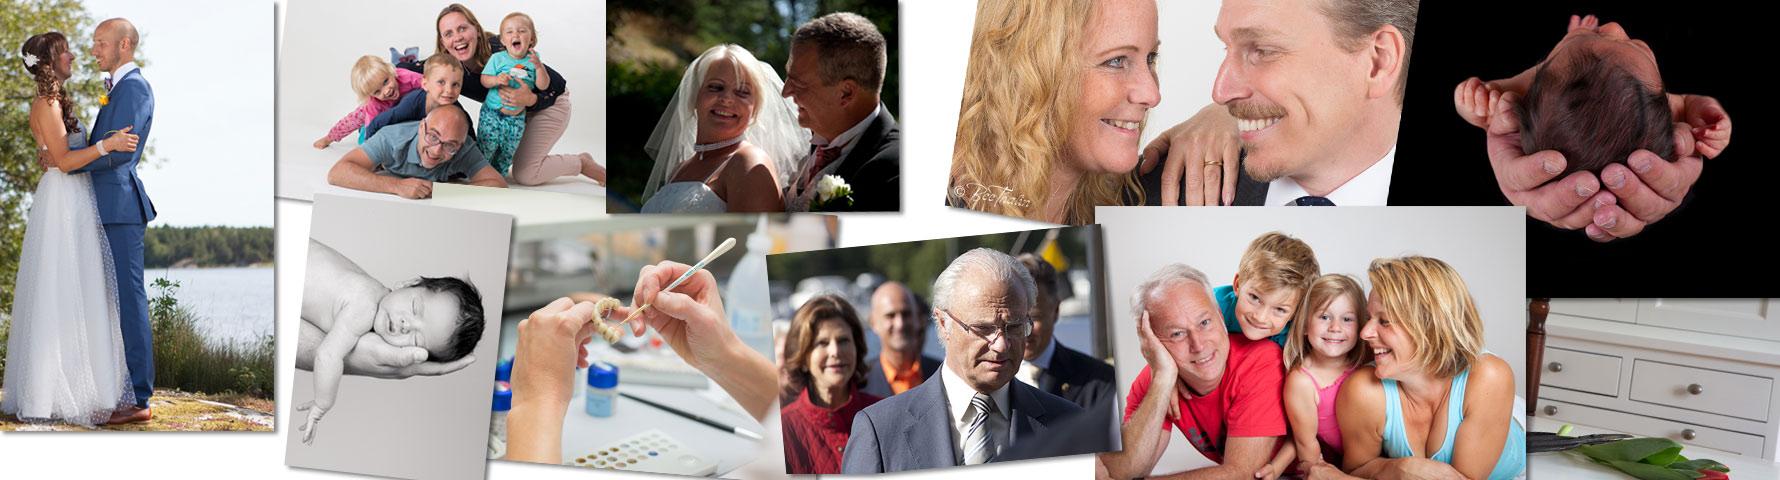 Fotograf - bröllopfotograf, familjefotograf, barnfotograf, bebisfotograf, studiofotograf, värmdöfotograf